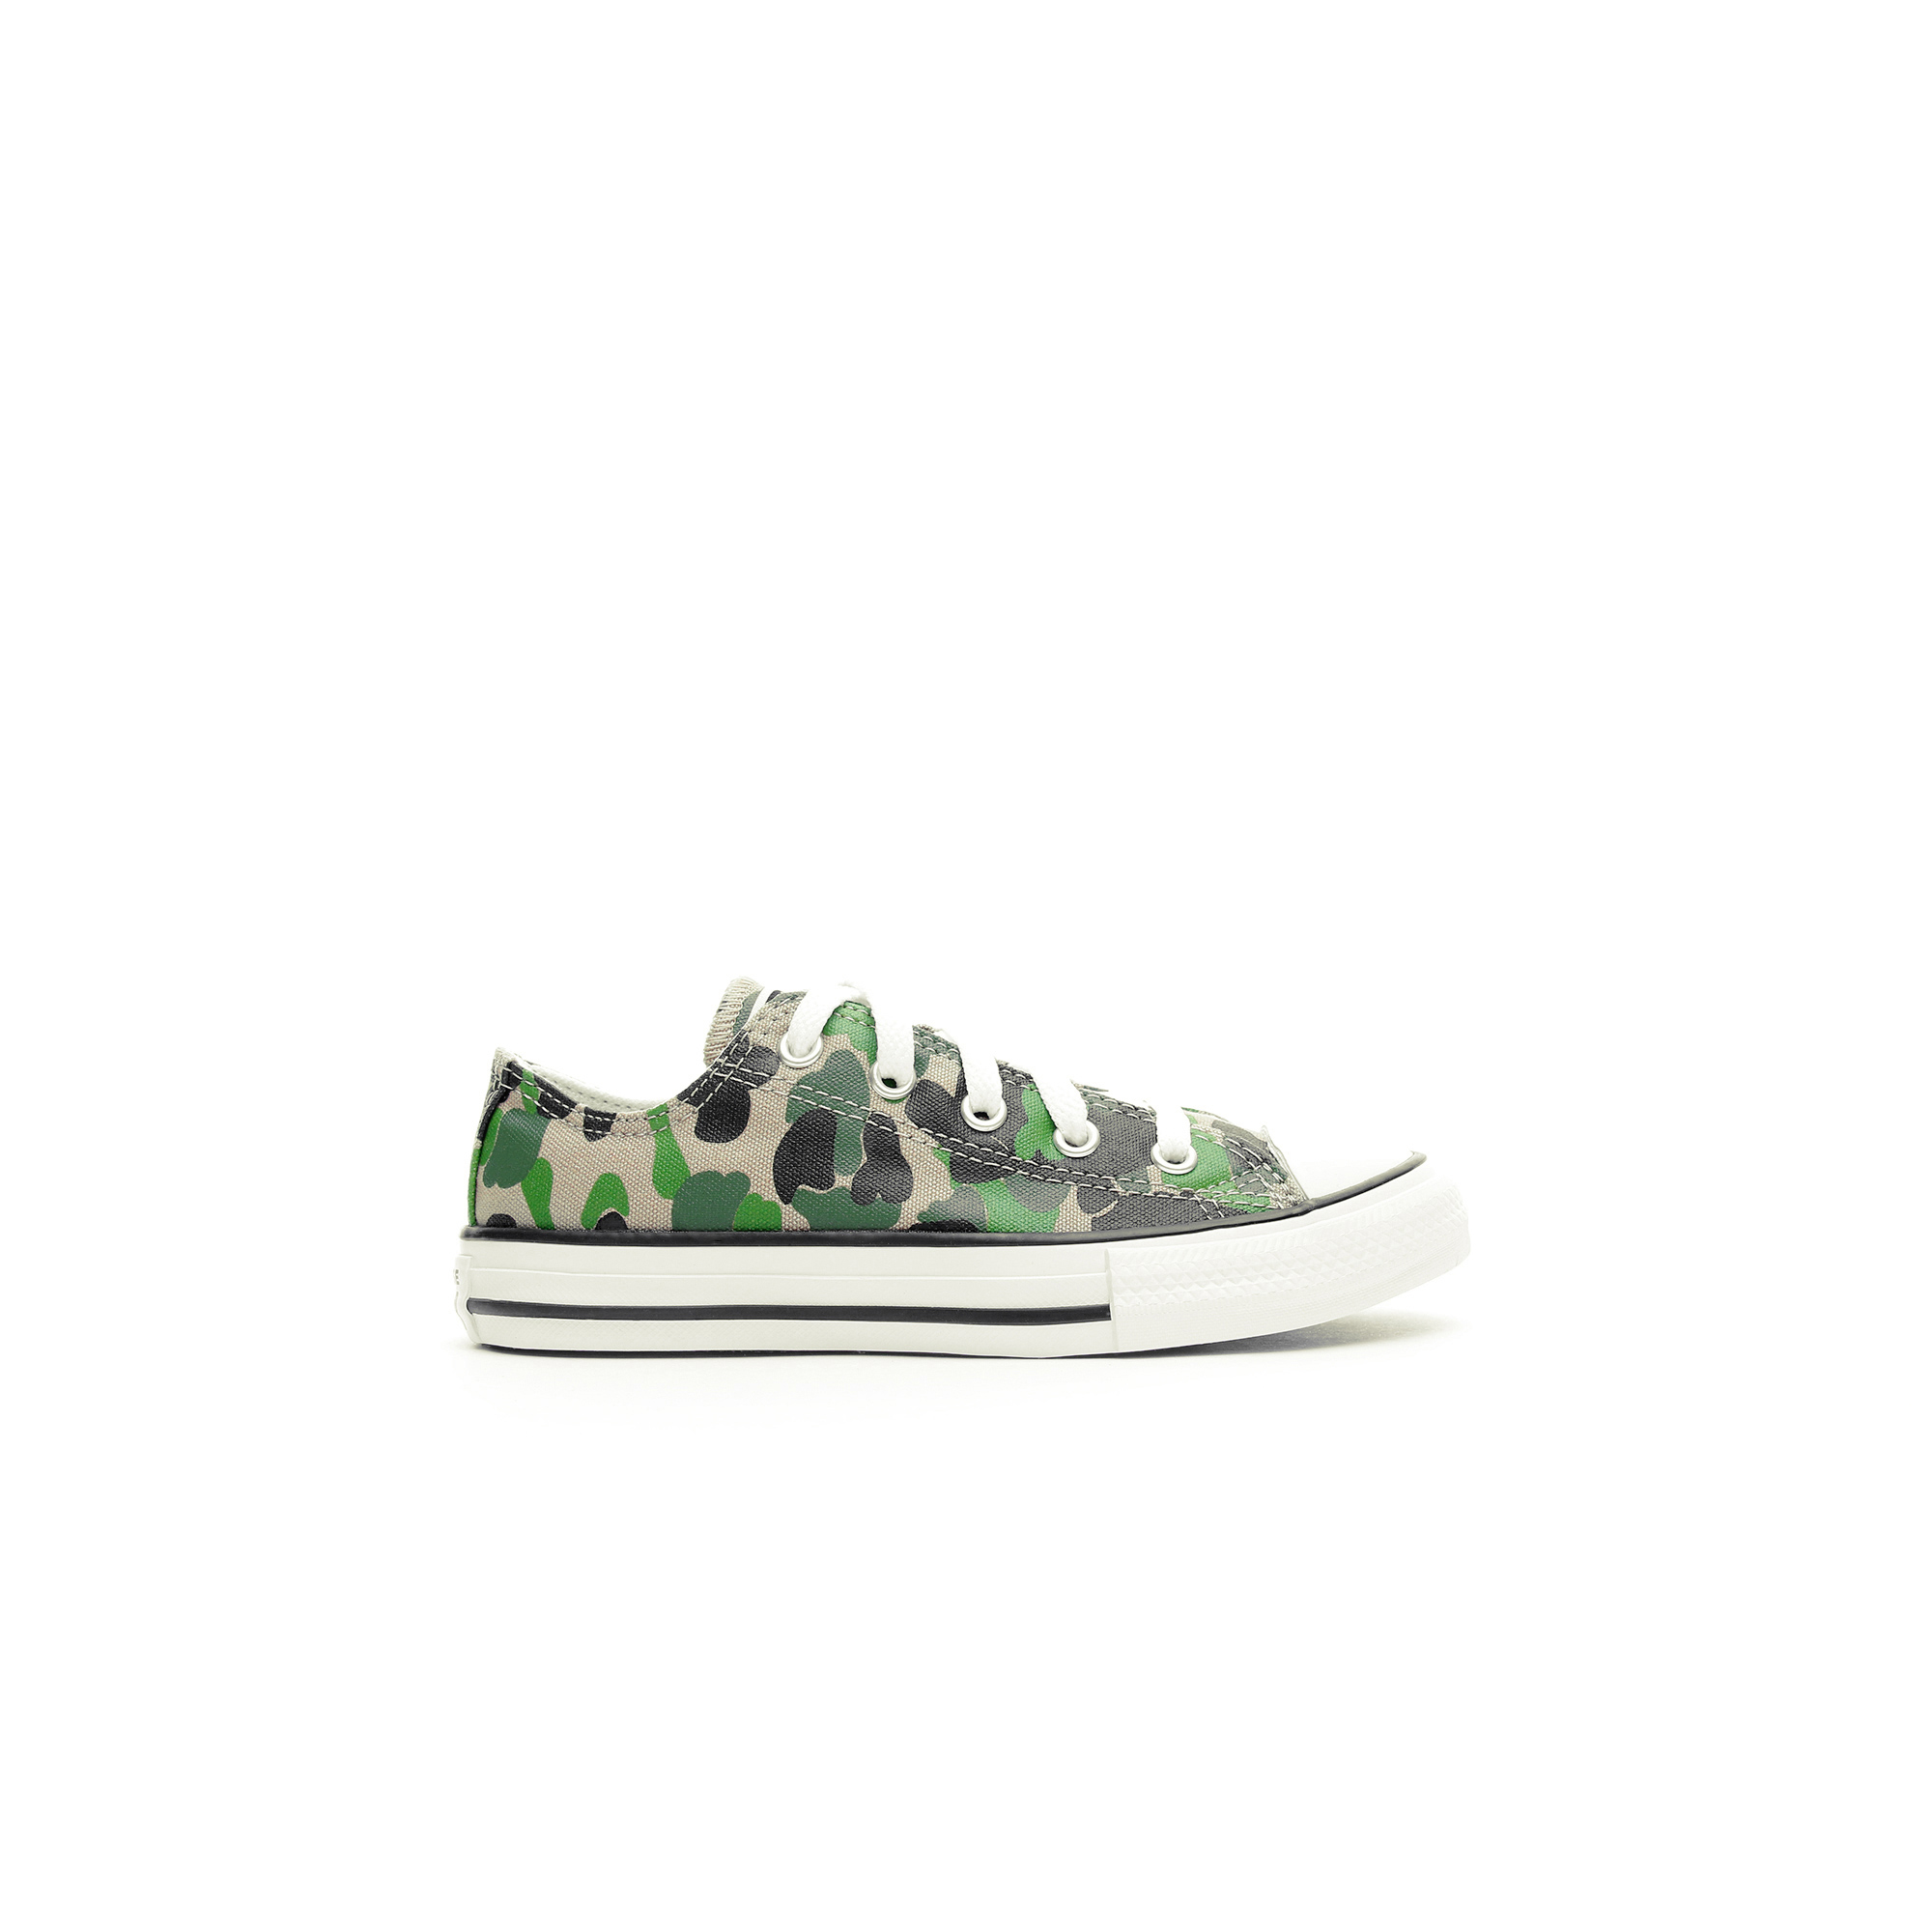 Converse Chuck Taylor All Star  Çocuk Yeşil Sneaker